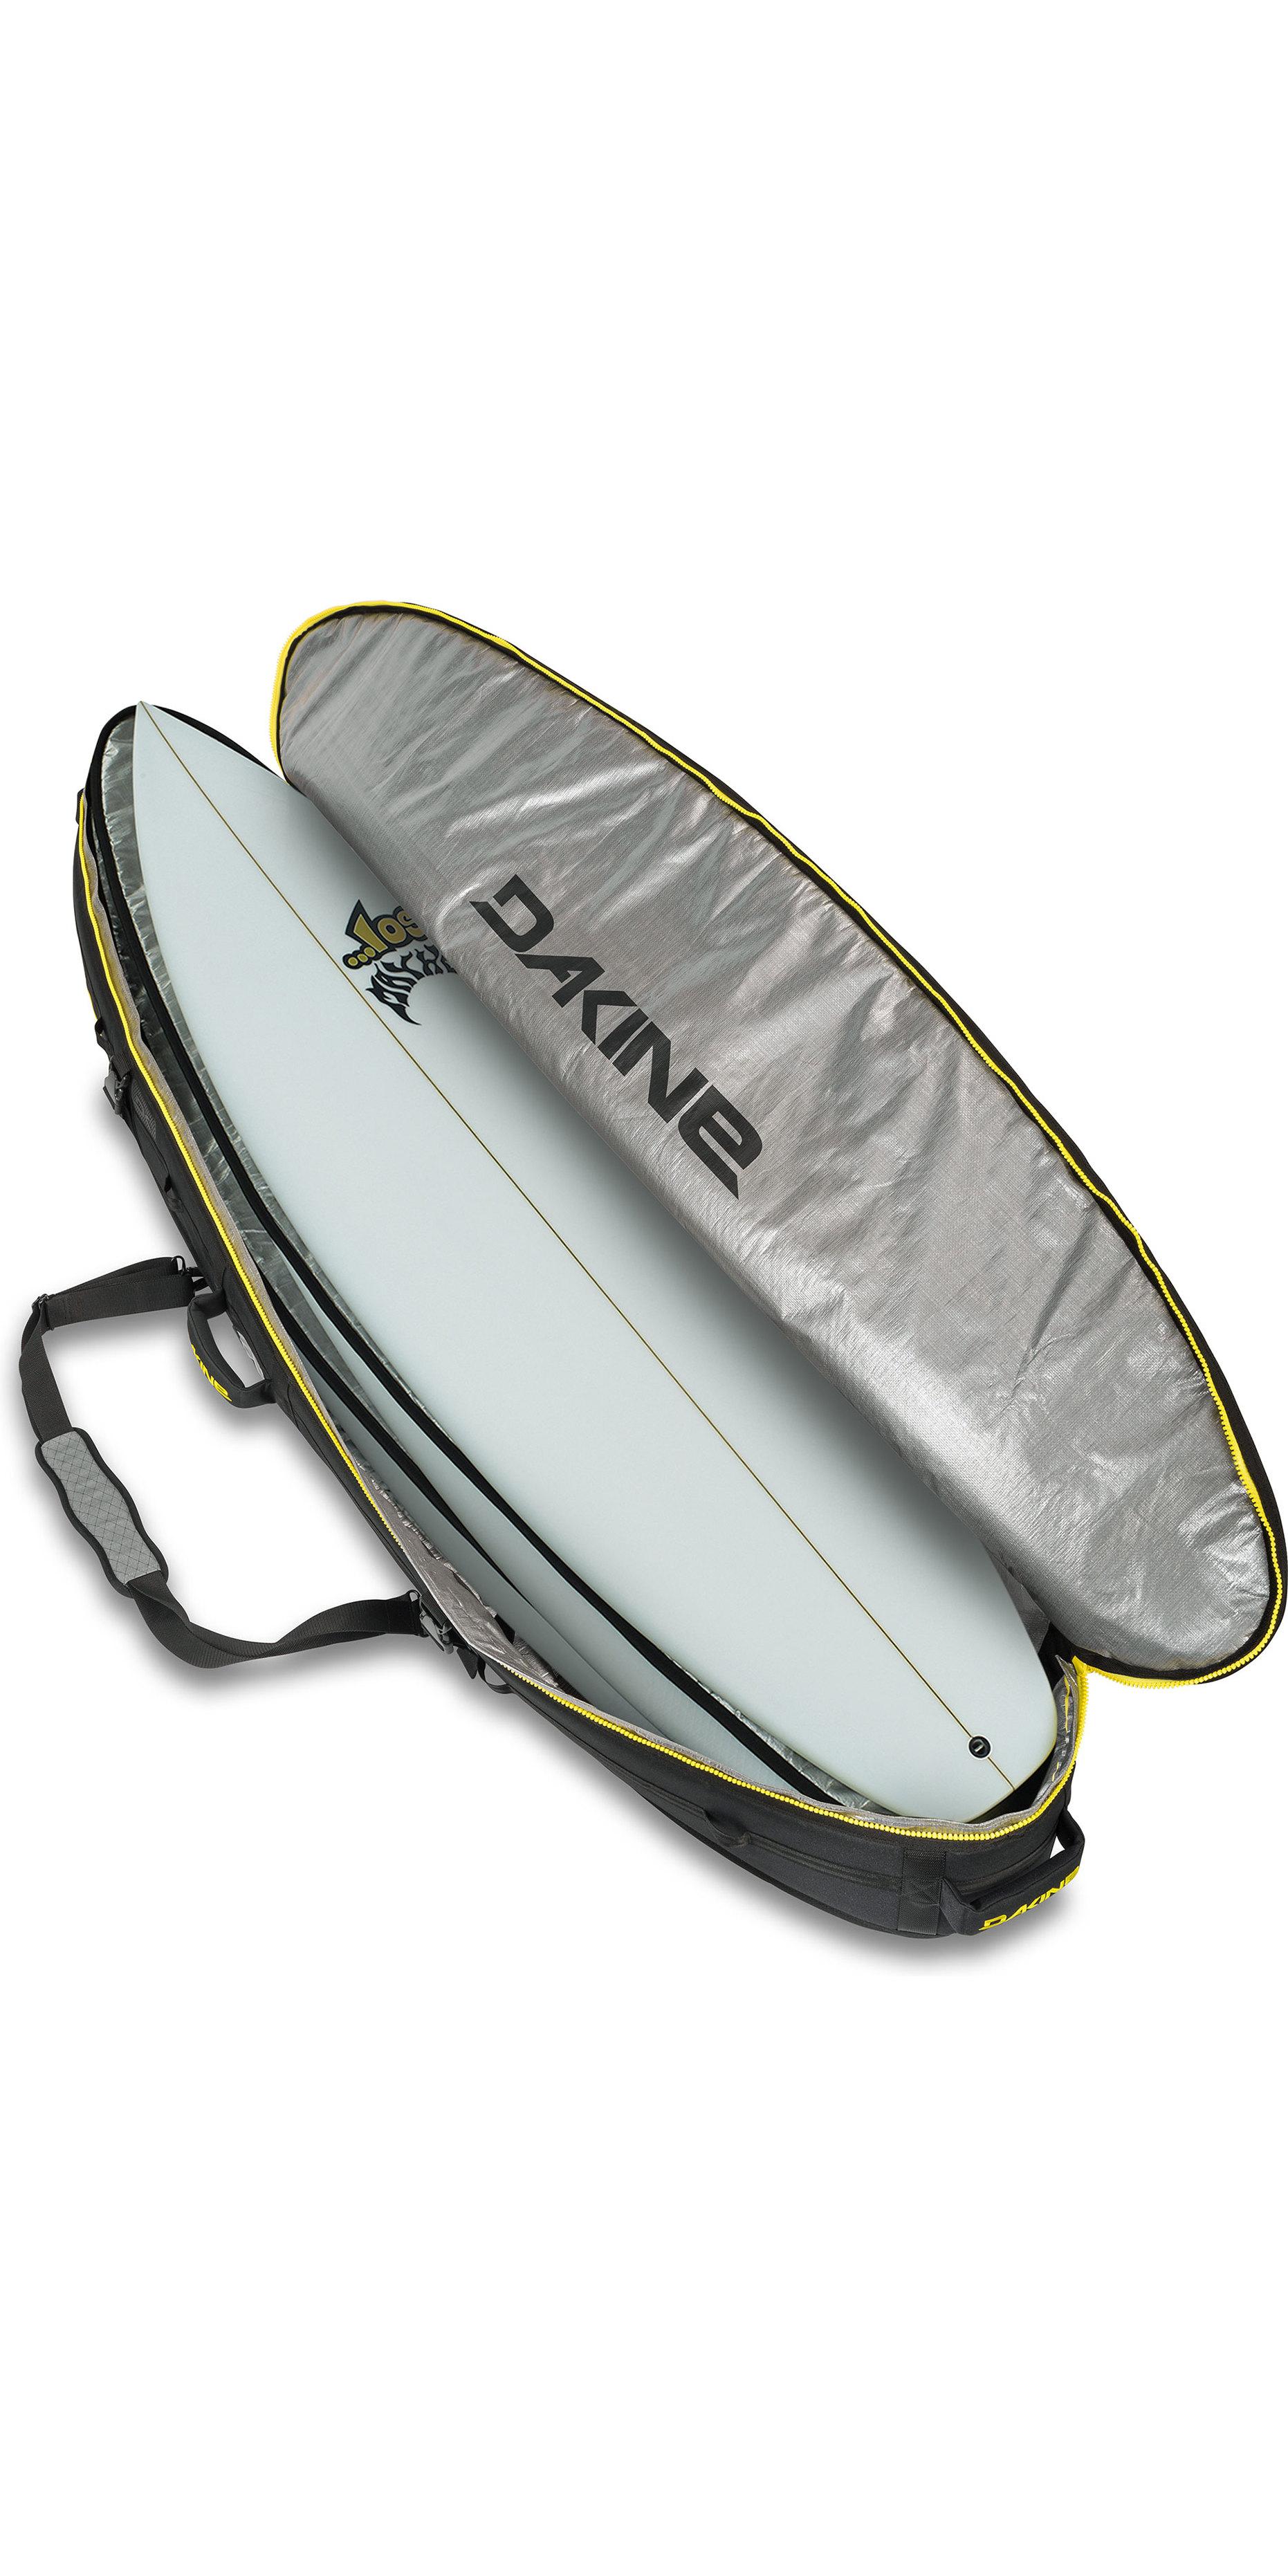 2019 Dakine Regulator Triple Surfboard Bag 7